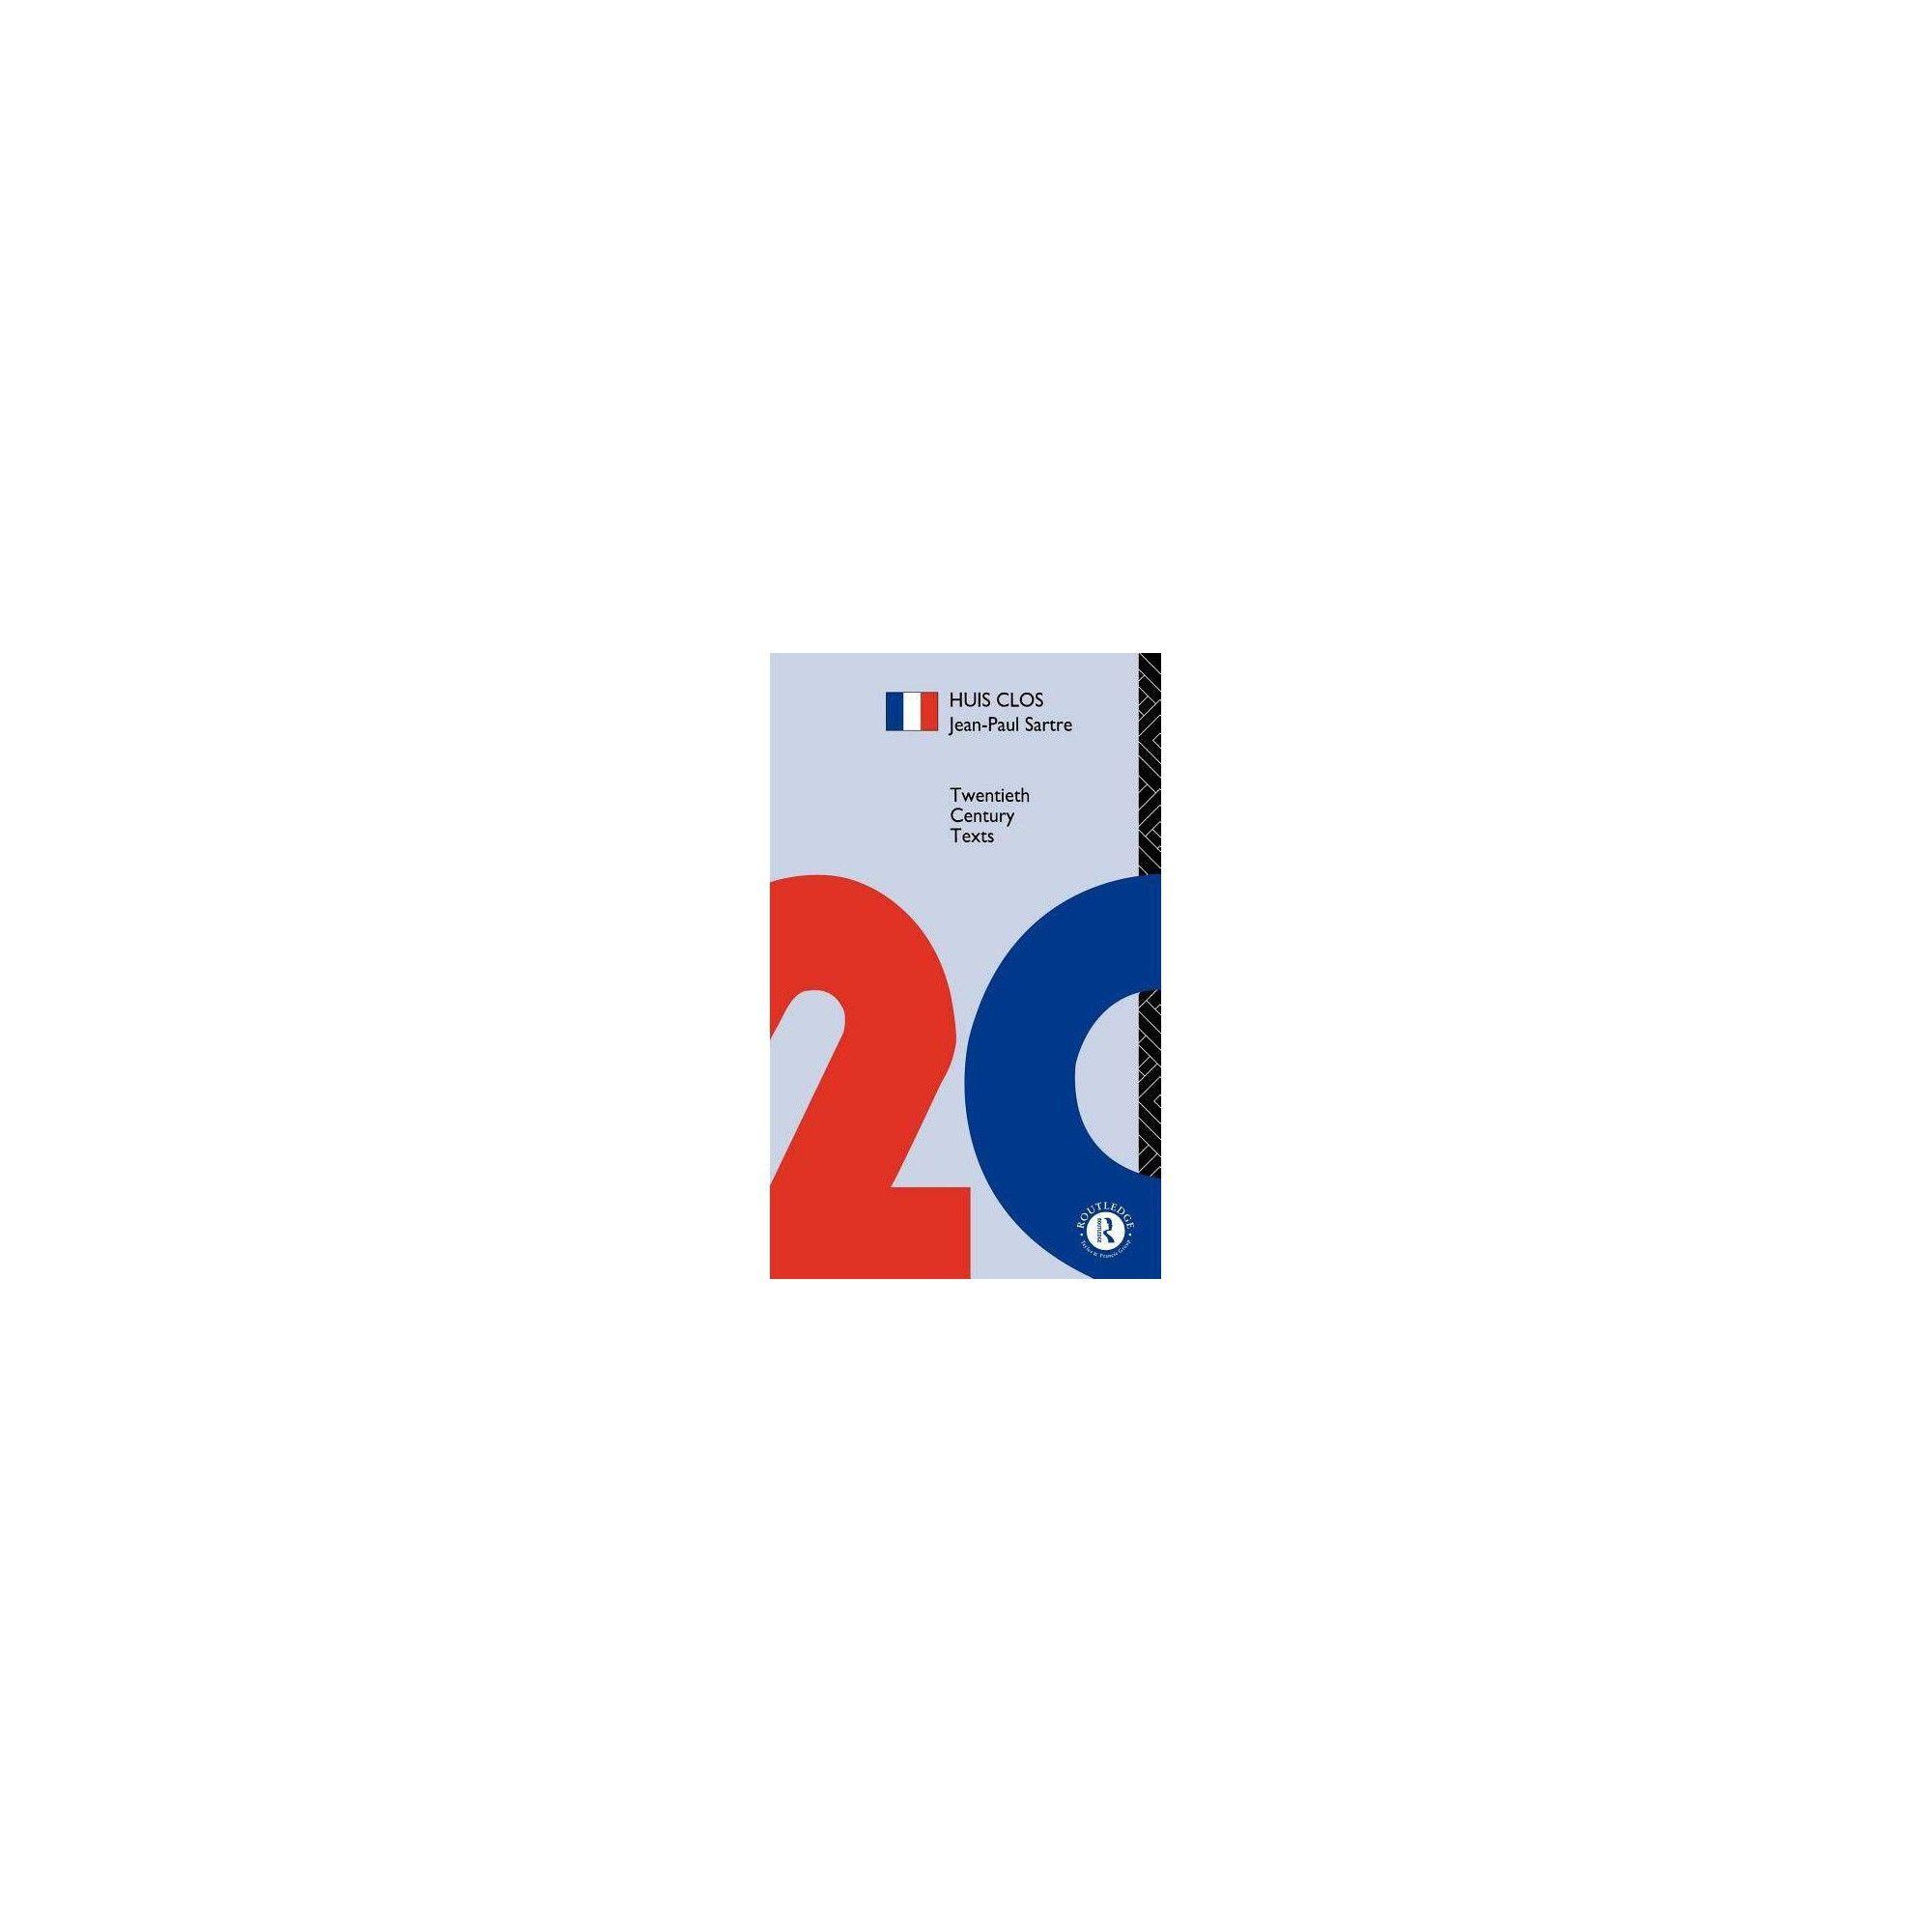 Huis Clos - (Twentieth Century Texts) by Jean-Paul Sartre & J P Sartre (Paperback) #jeanpaulsartre